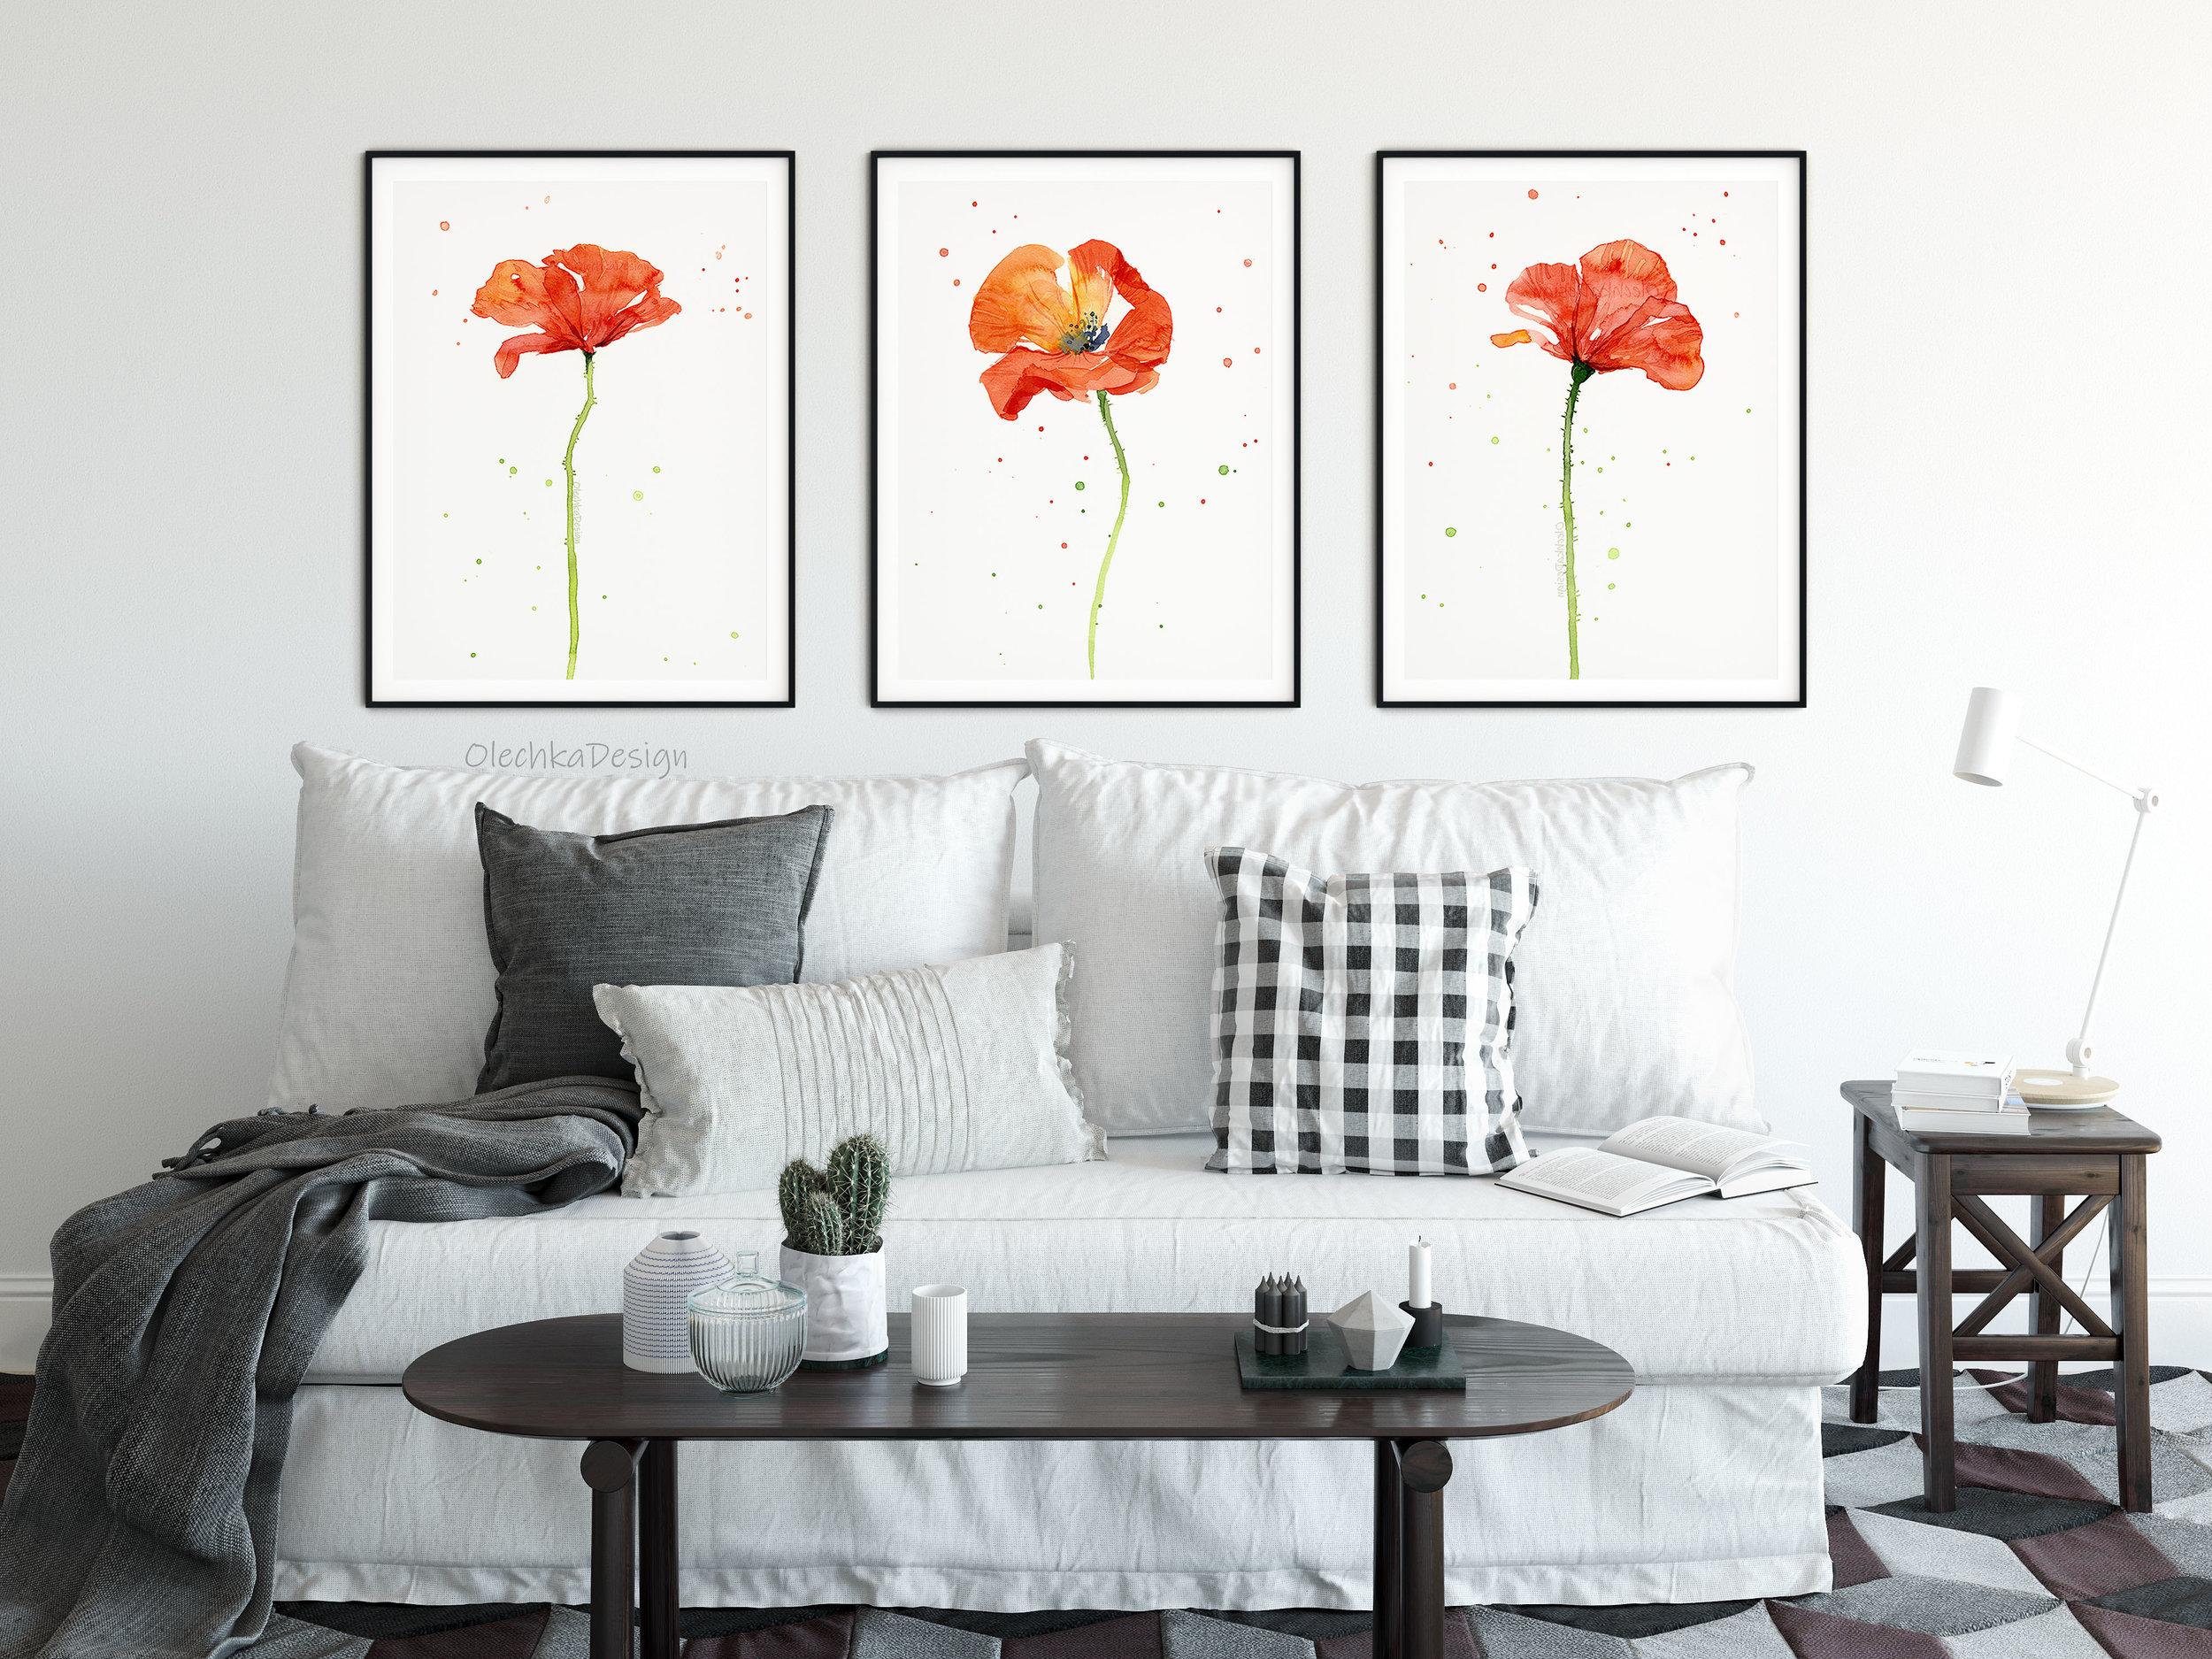 Poppy-watercolor-art-prints.jpg